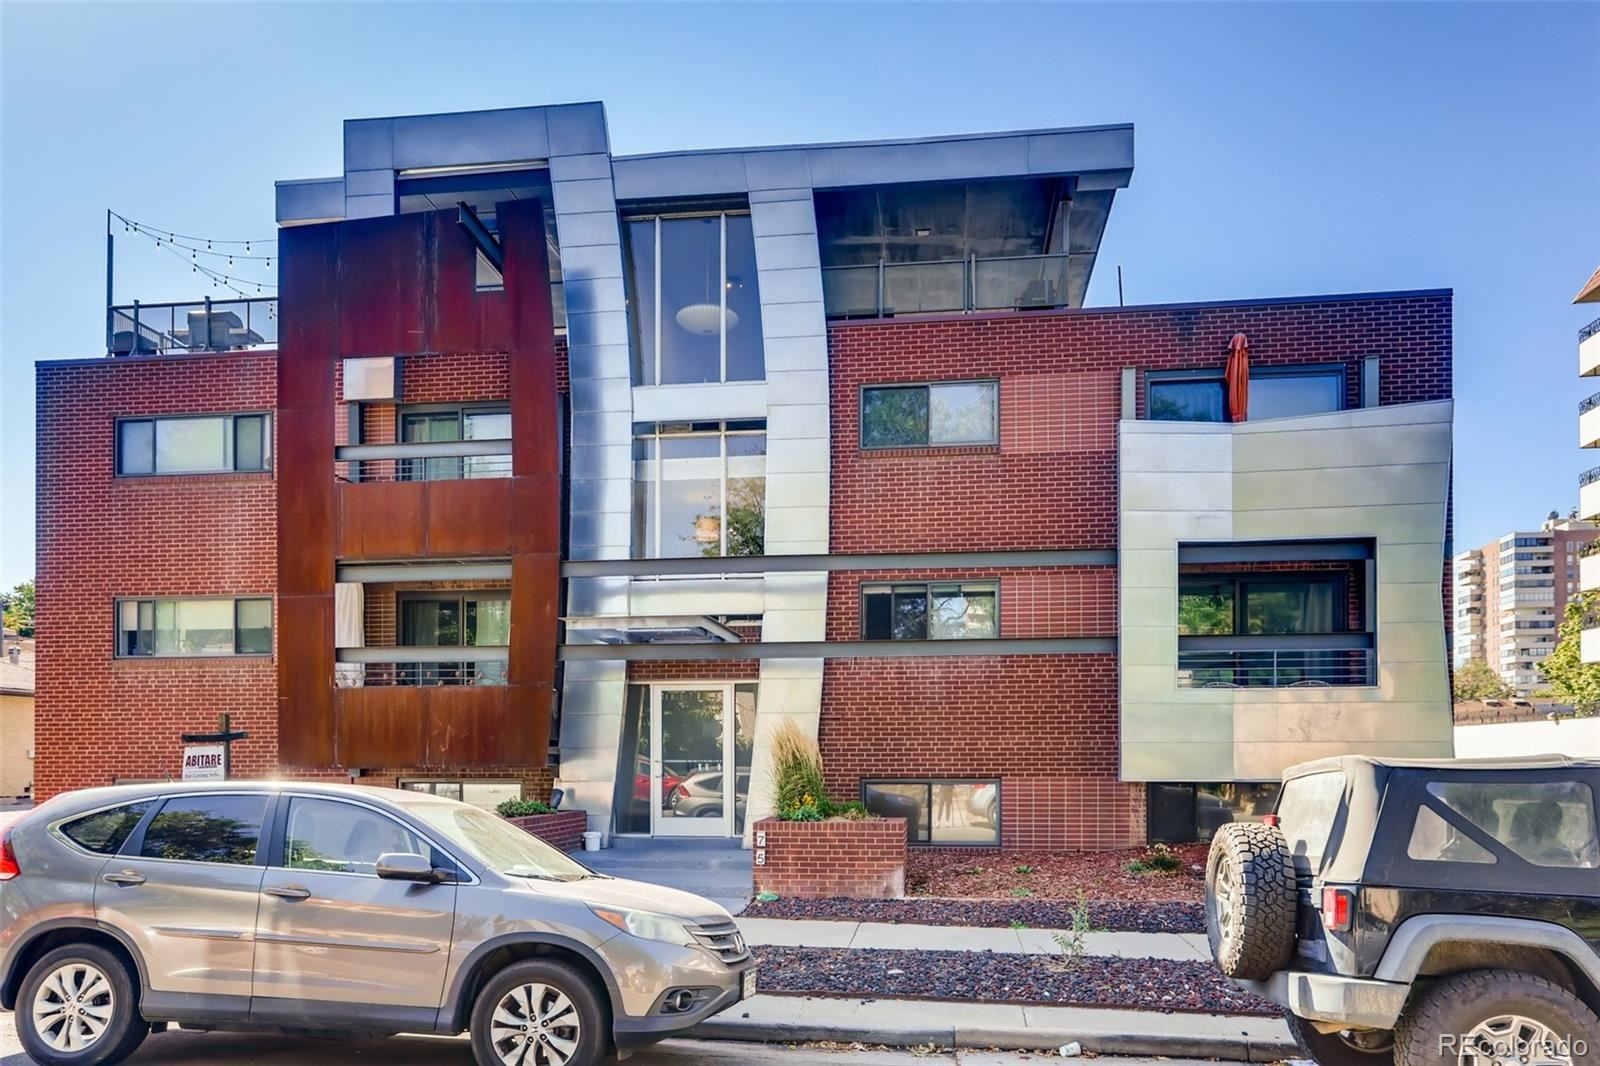 Photo of 75 N Emerson Street #201, Denver, CO 80218 (MLS # 2006379)